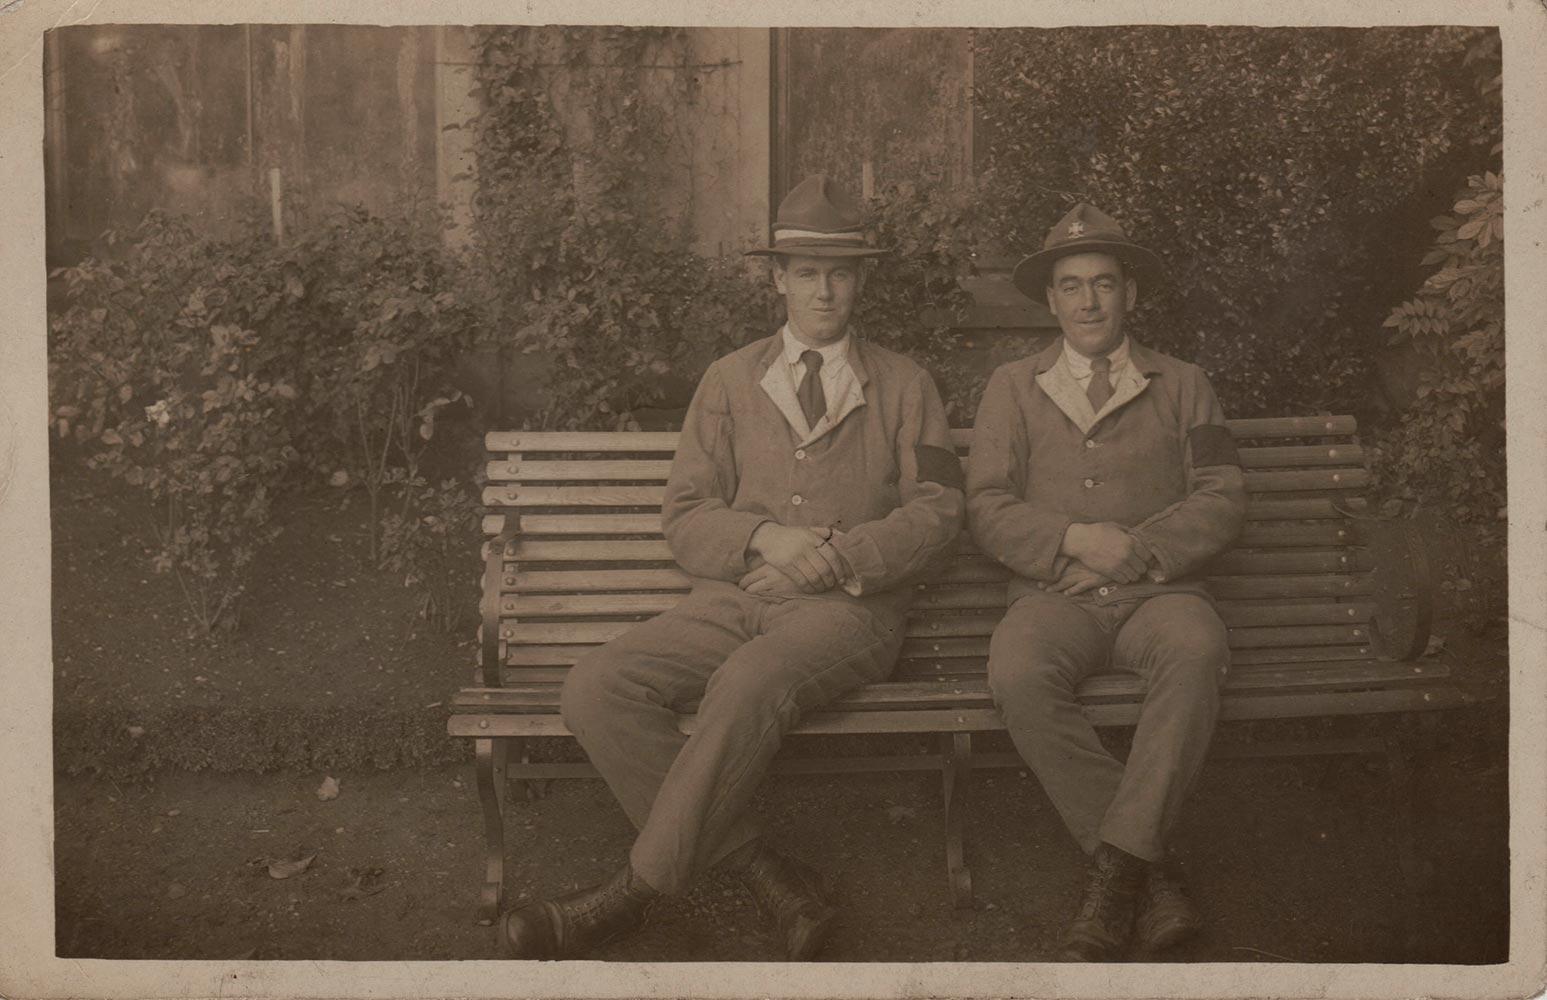 Allan Murphy (right)